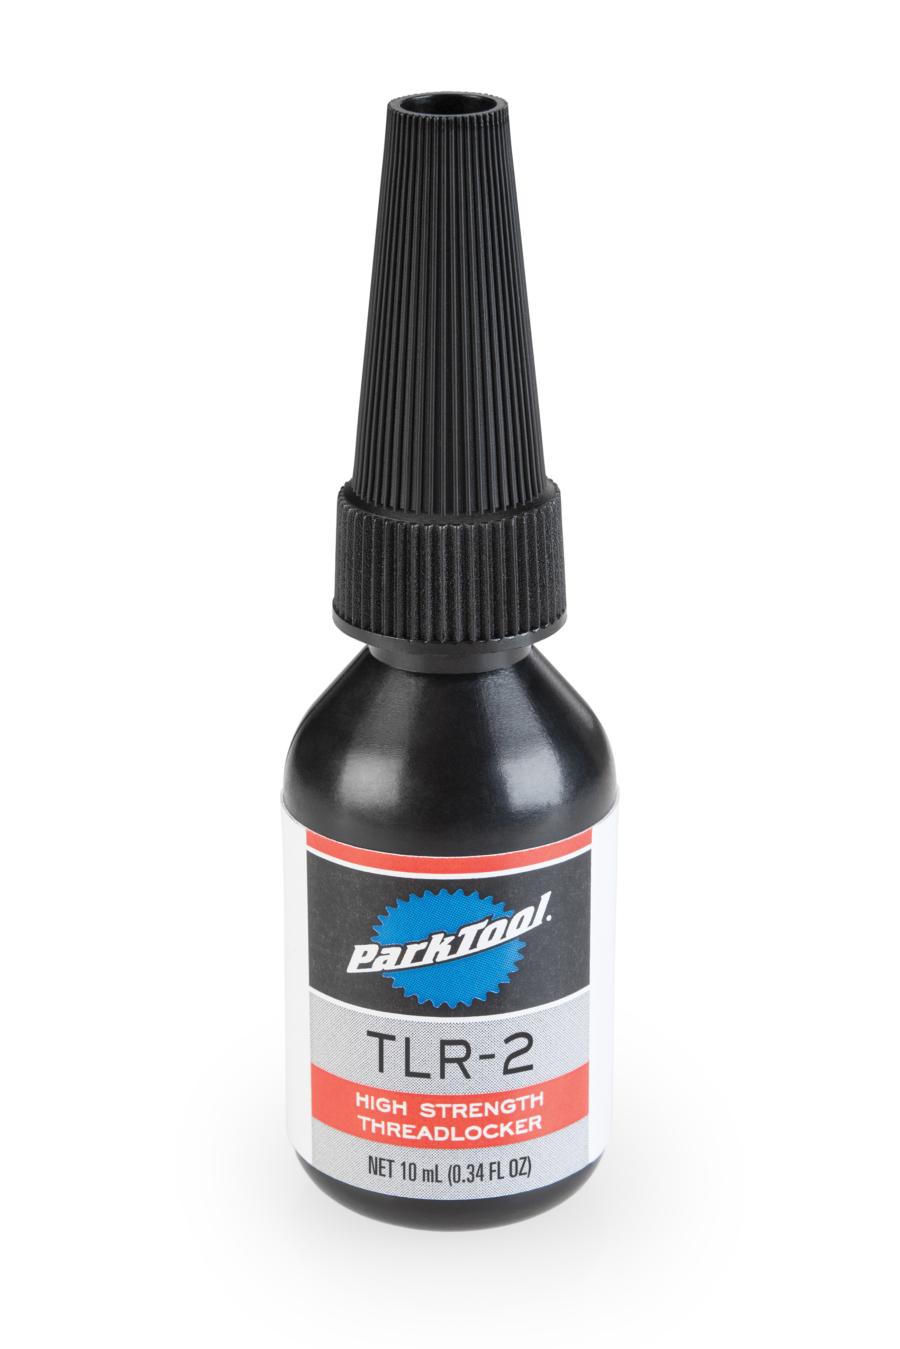 The Park Tool TLR-2 High Strength Threadlocker, enlarged